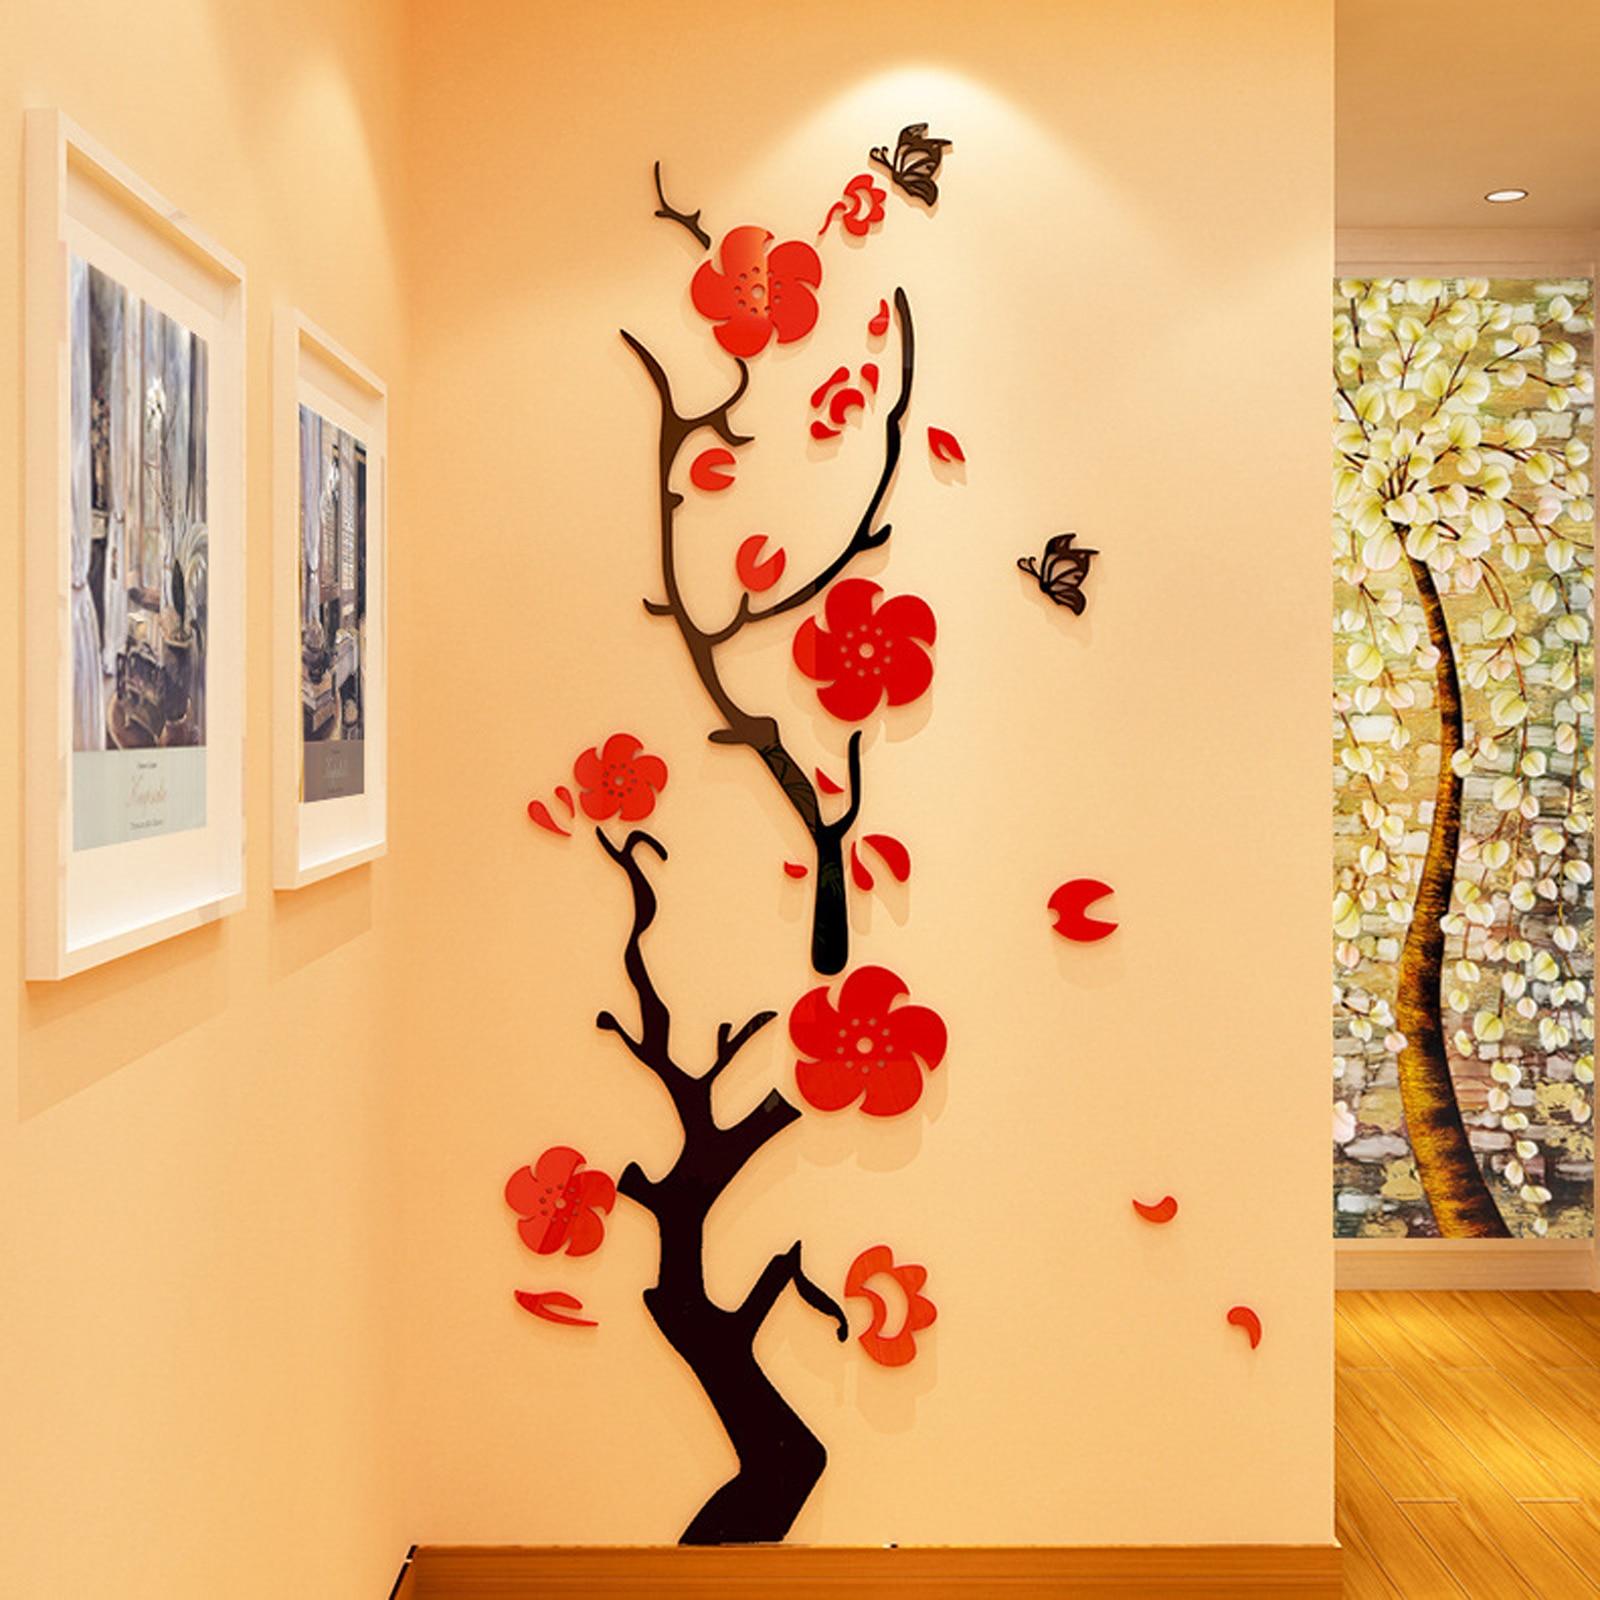 Perfect Wall Art Flowers Model - All About Wallart - adelgazare.info